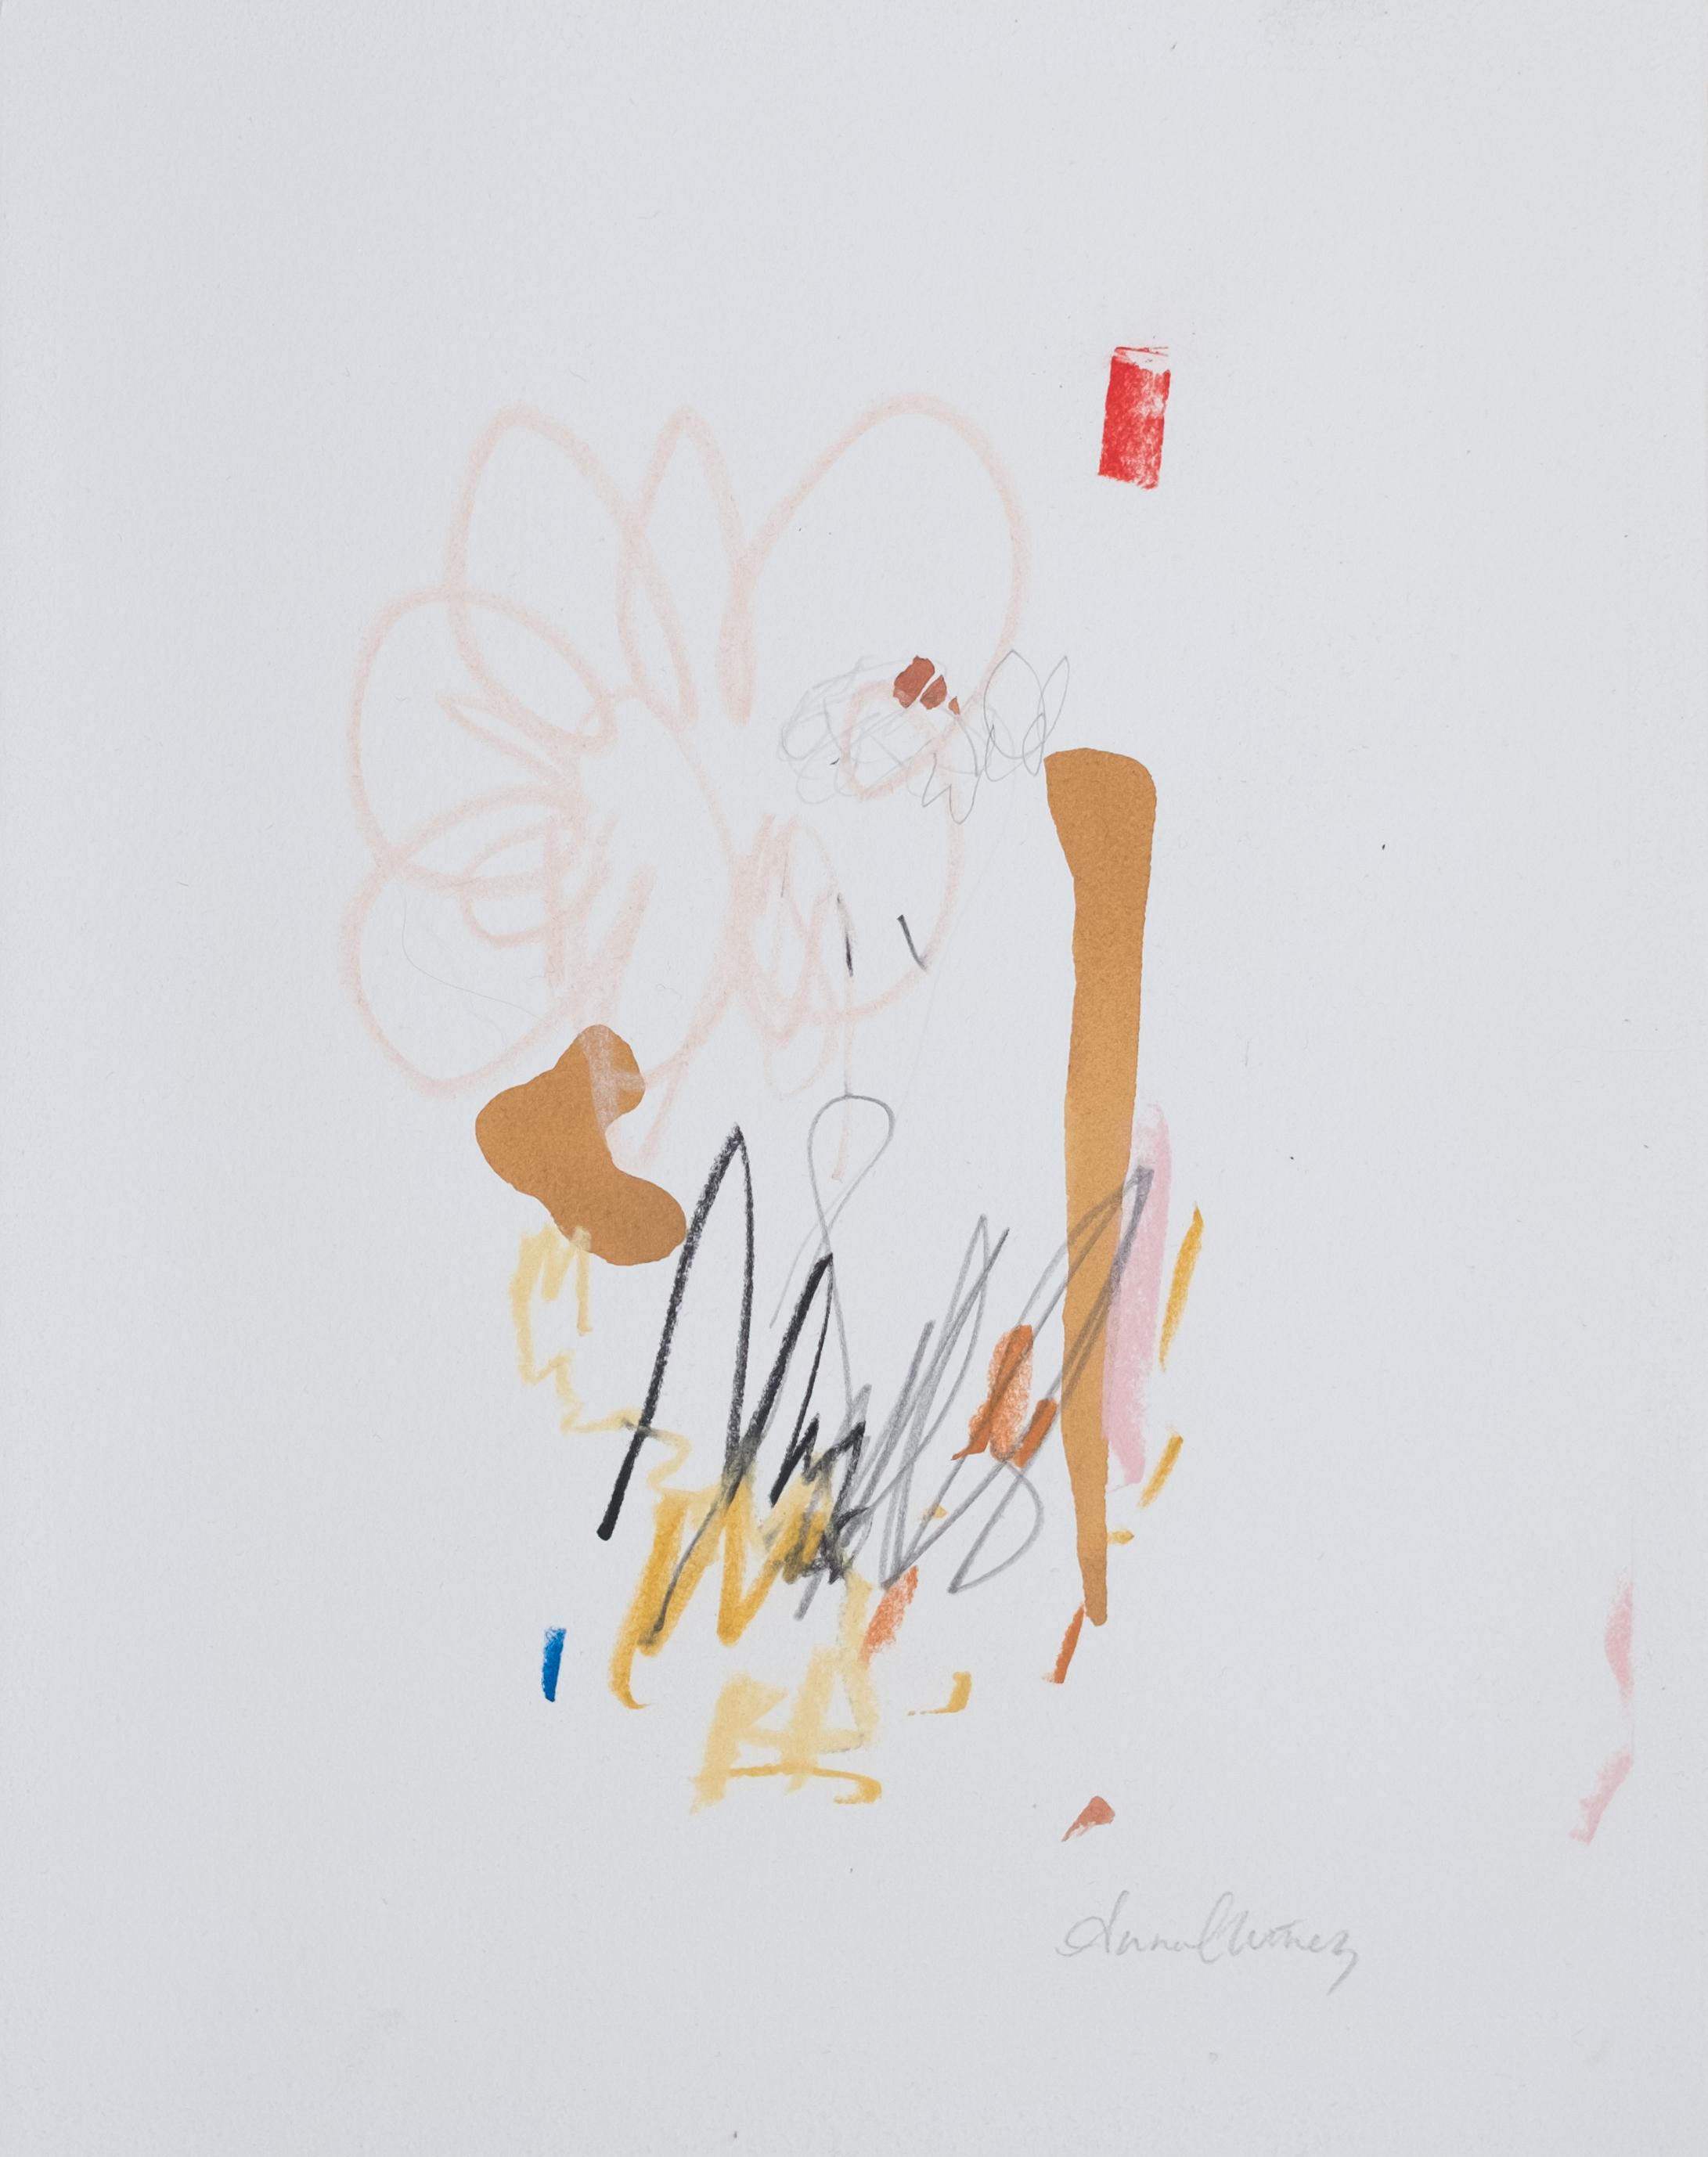 "Child / 11"" x 14"" / water color, graphite, chalk pastel on cotton paper"